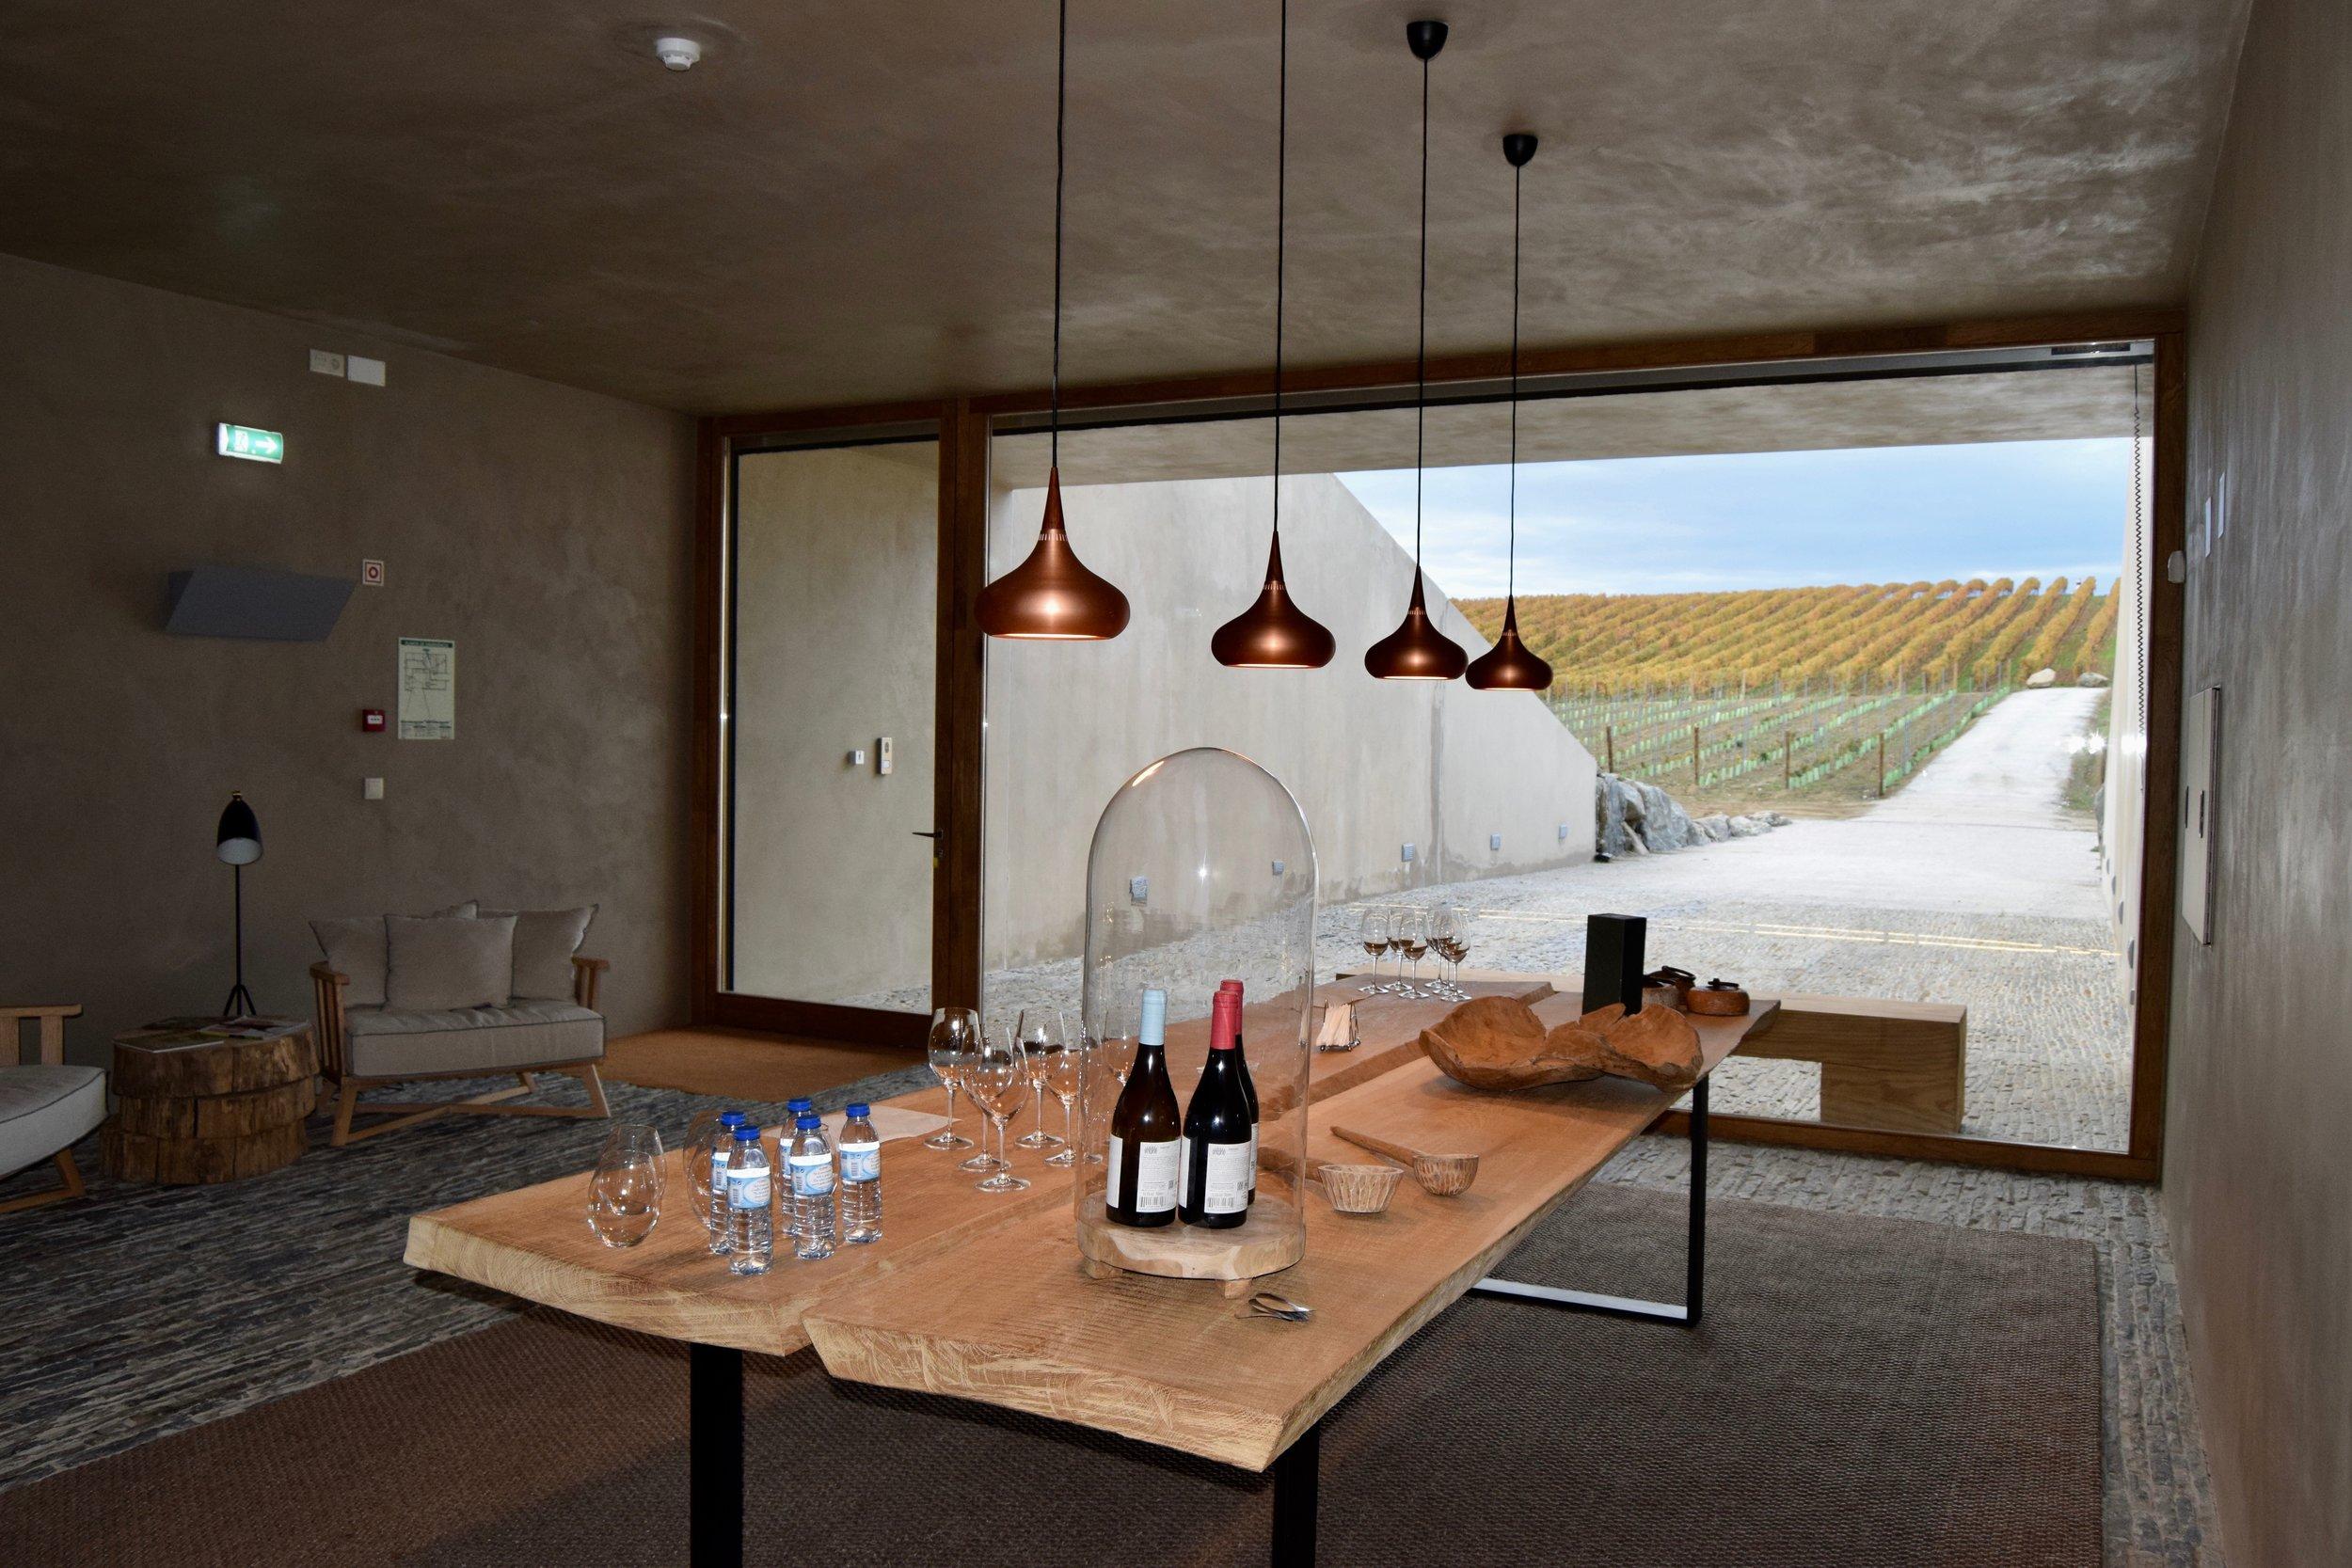 herdade de freixo, first underground winery in europe (40 meters/131 feet)